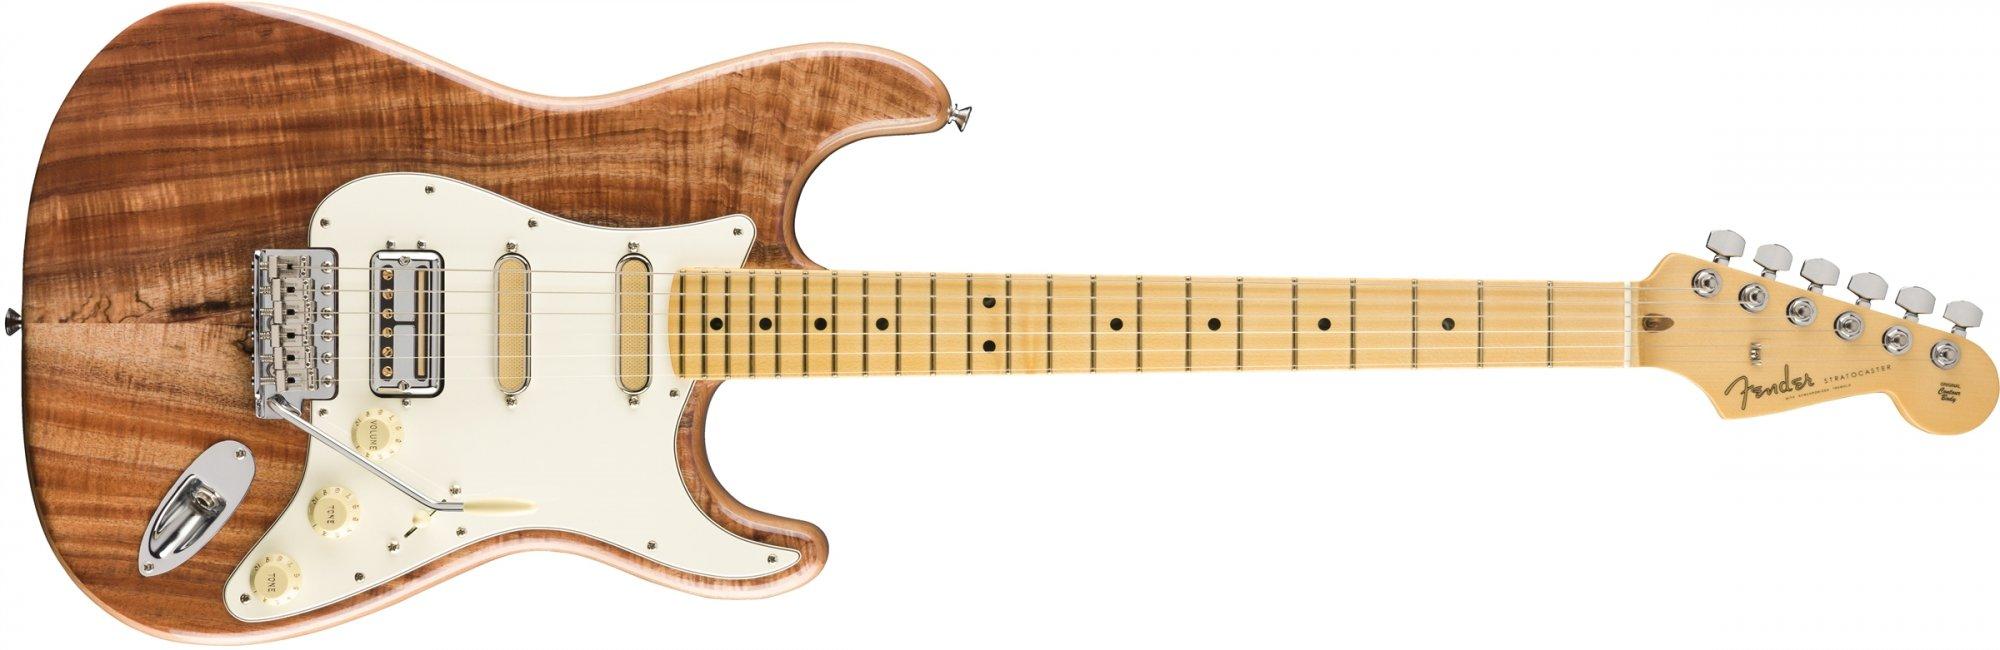 Fender Rarities Stratocaster Flame Koa Top Maple